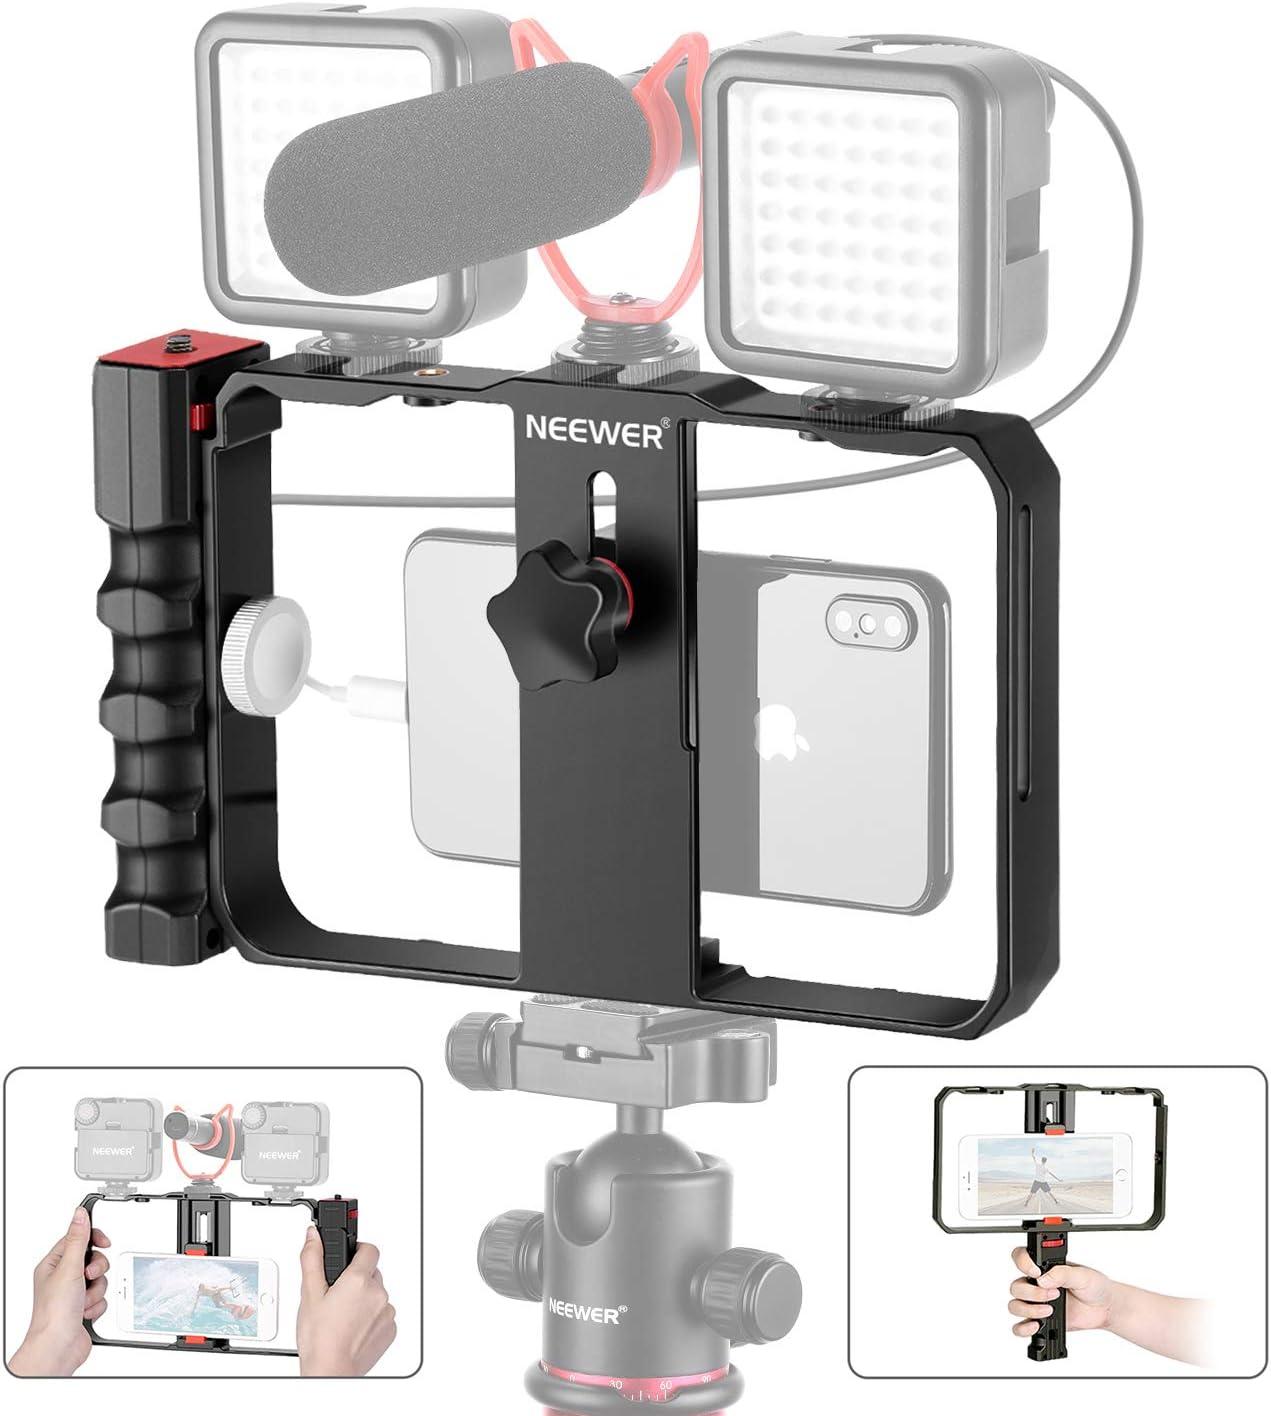 Neewer Plataforma Video Estabilizador Cámara Teléfono Estuche de ...